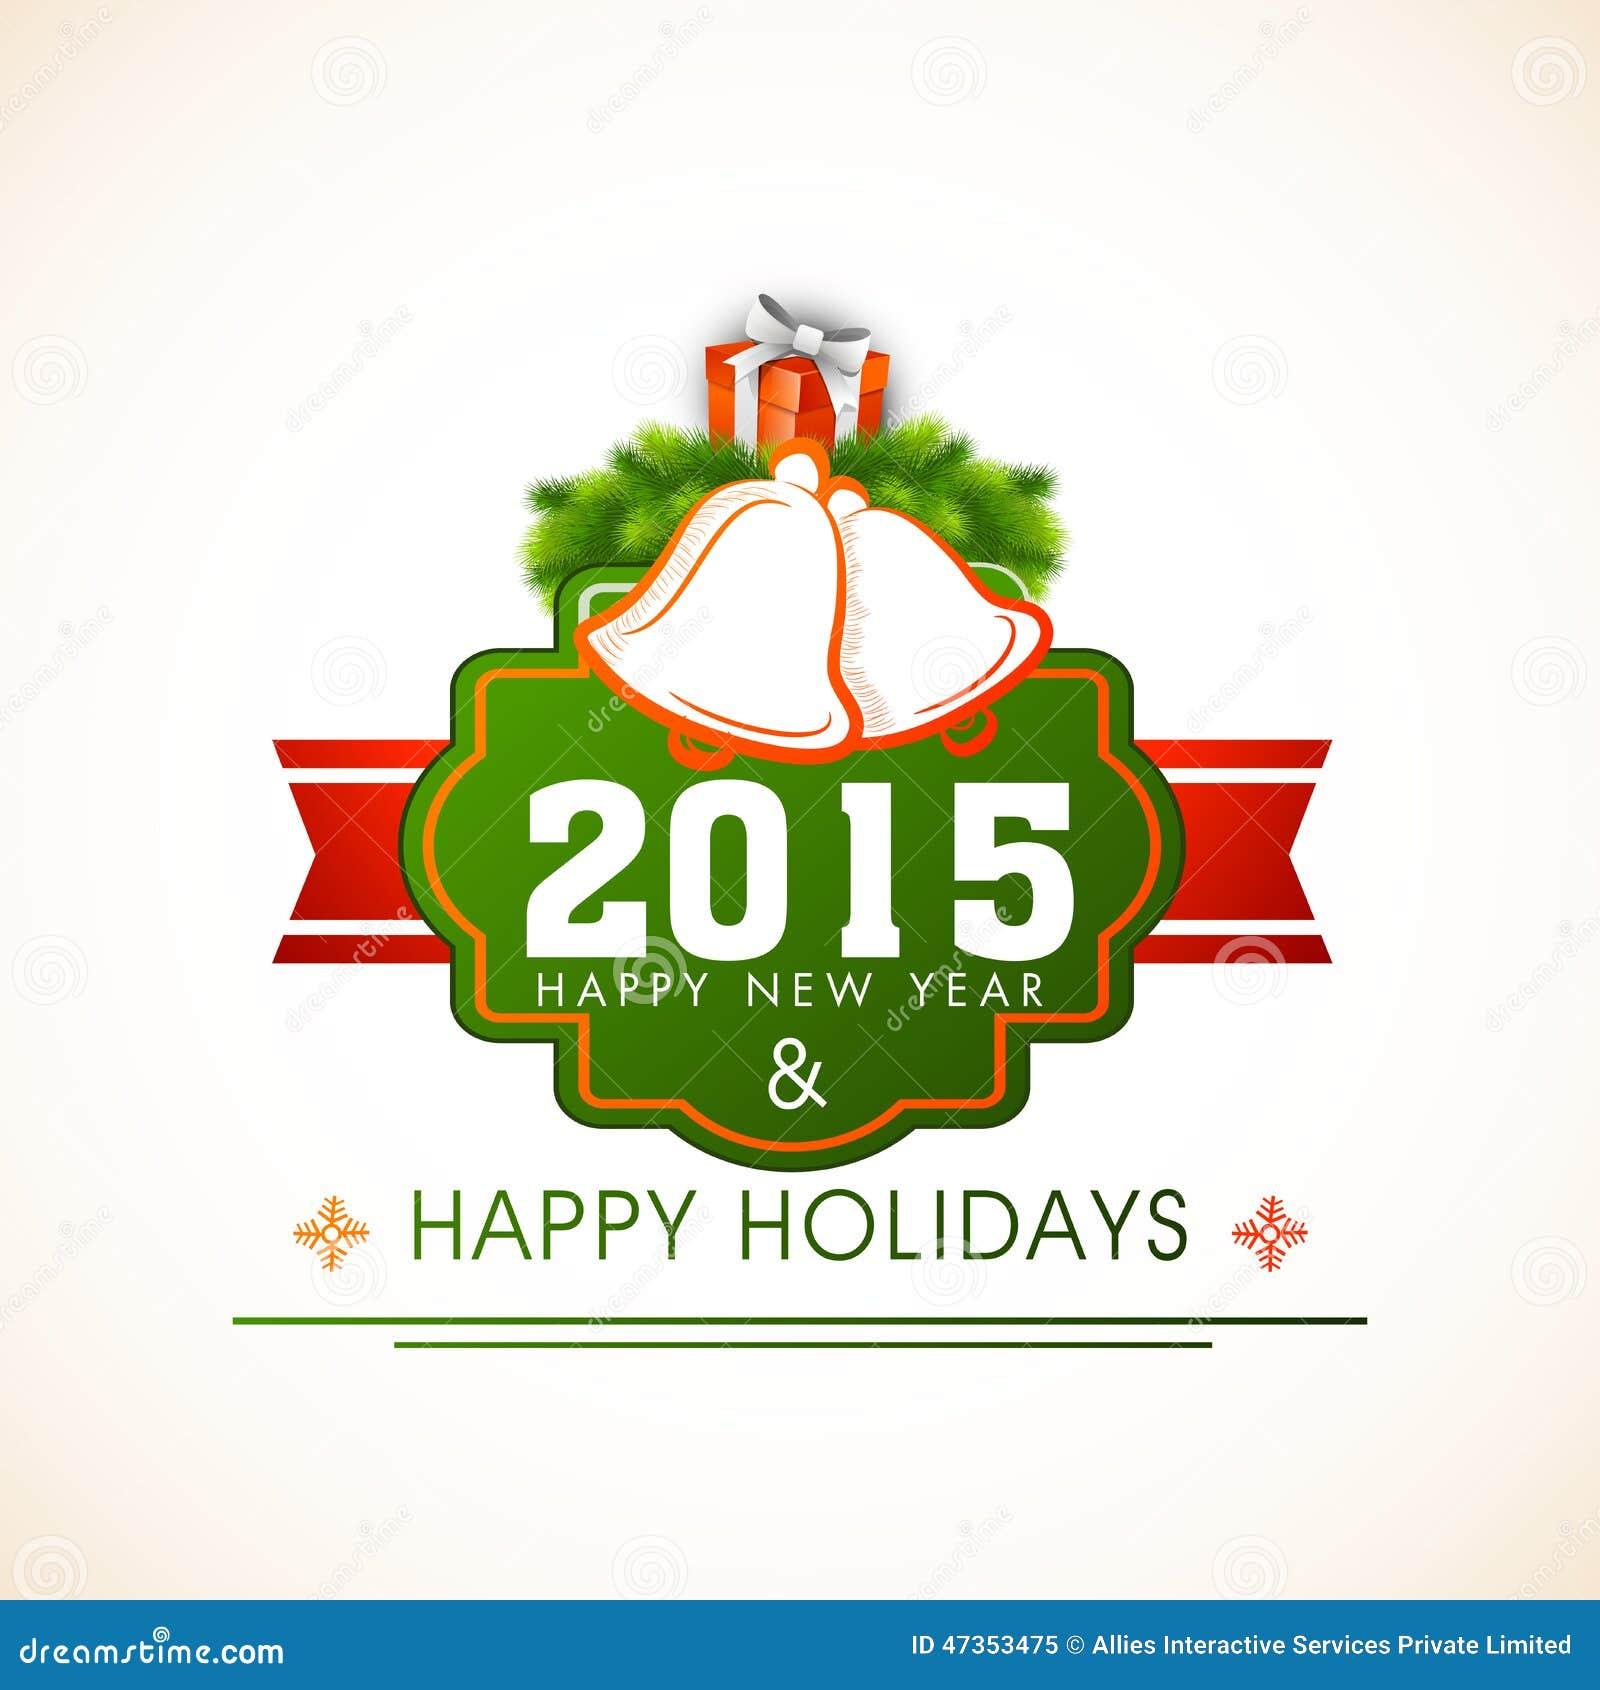 Brc Holiday Celebration Photos 2015: Happy New Year 2015 Celebrations Concept. Stock Photo